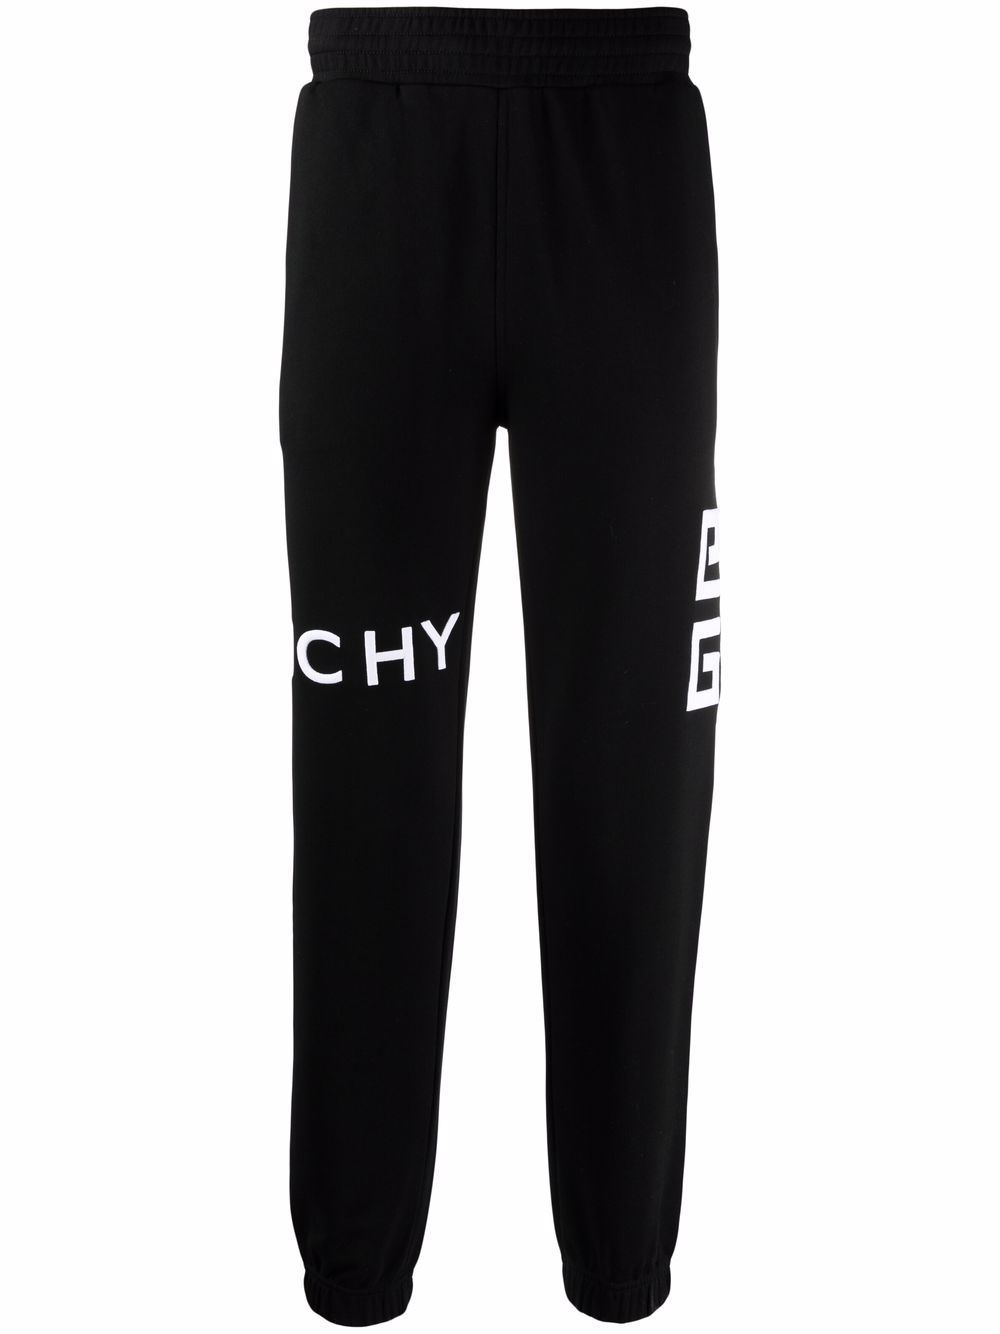 Black cotton Givenchy logo-print sweatpants   GIVENCHY      BM50WB3Y6U001